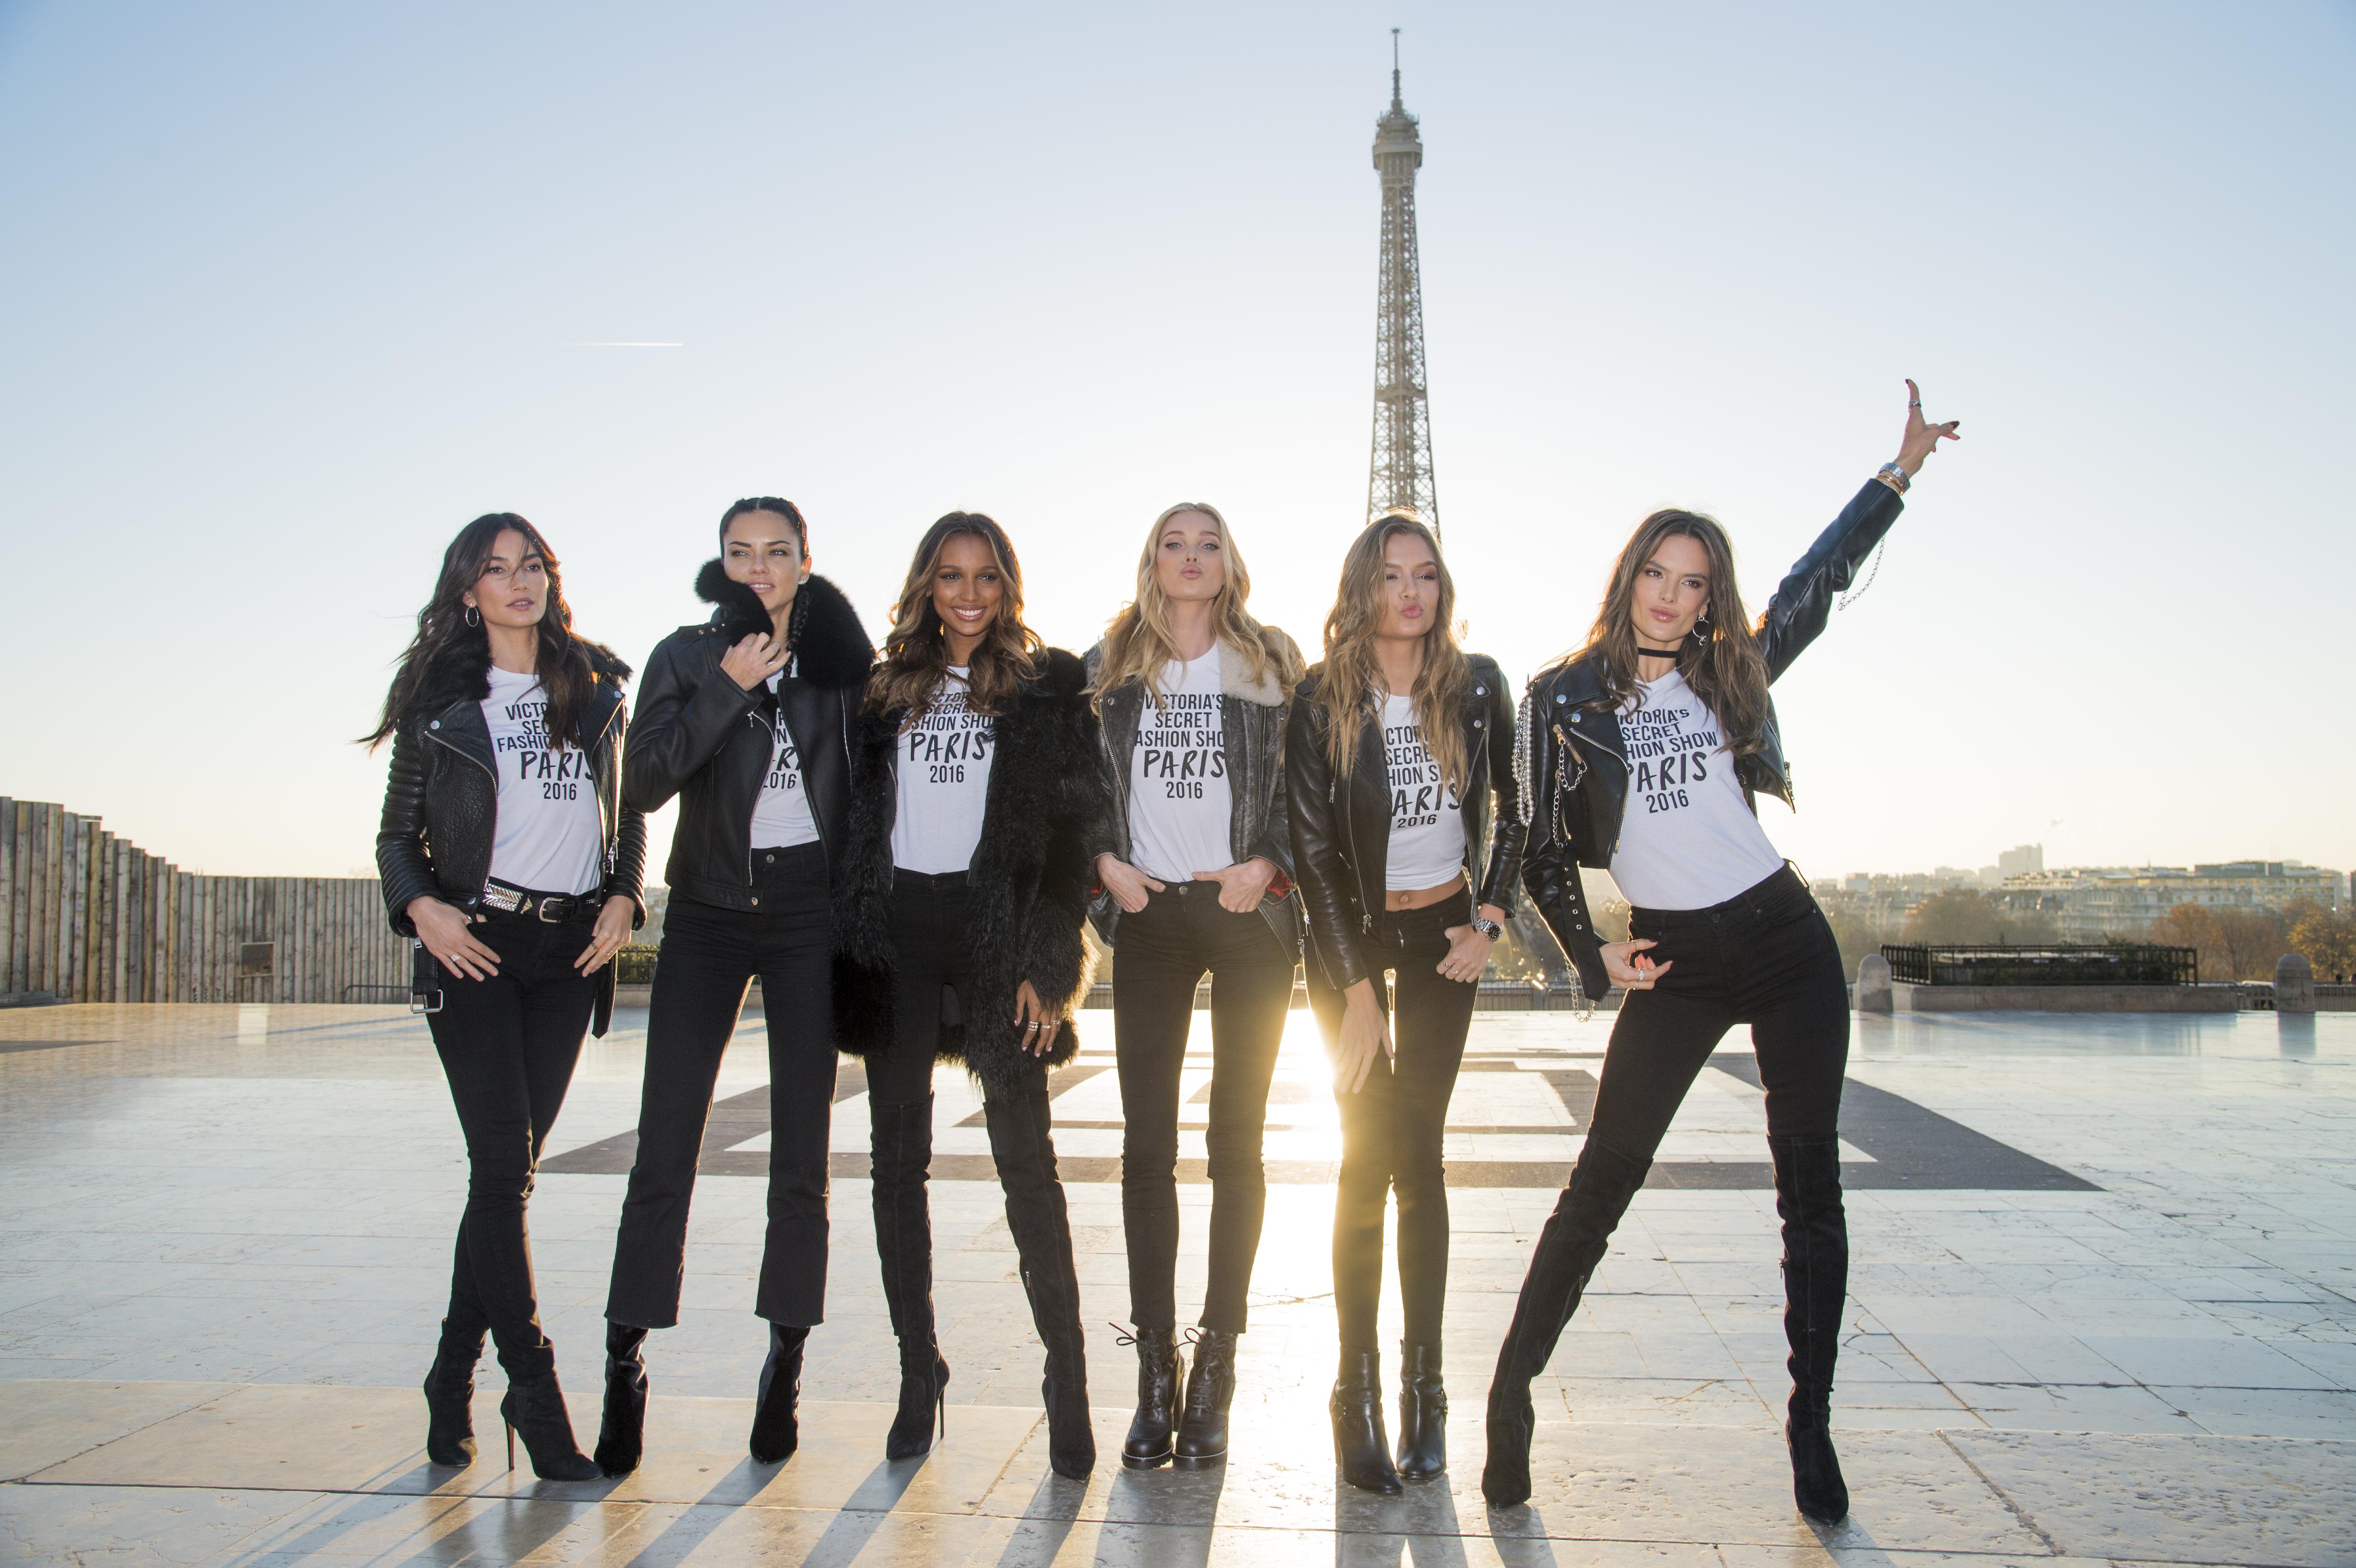 2016 Victoria's Secret Fashion Show - Eiffel Tower